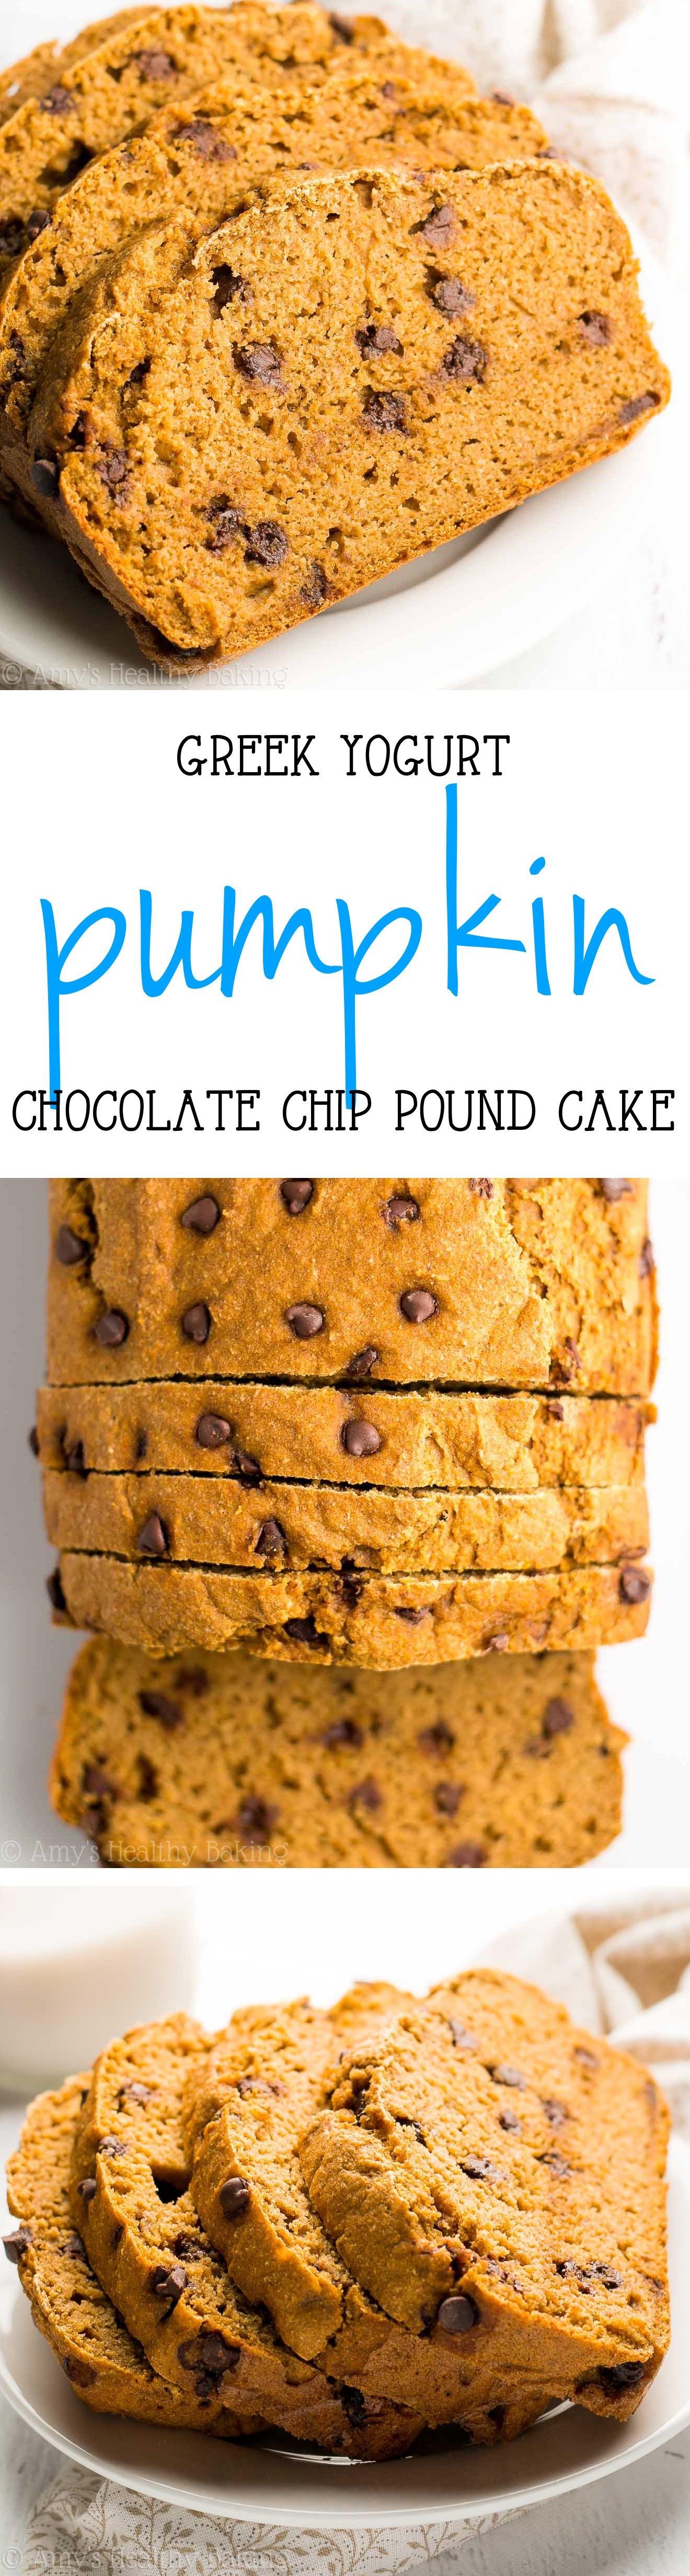 Greek Yogurt Pumpkin Chocolate Chip Pound Cake | Amy's Healthy Baking